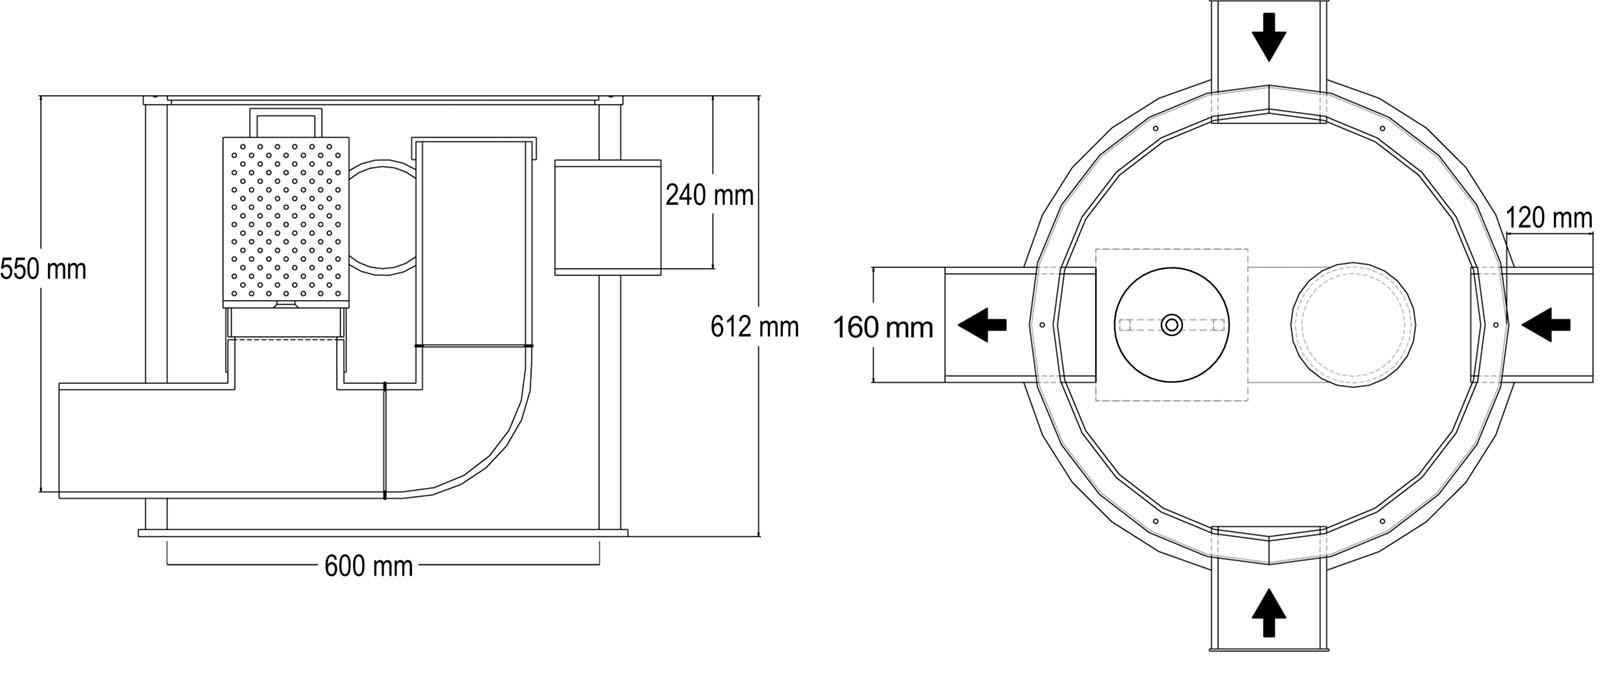 Controflow_SUDS03001_dimensions